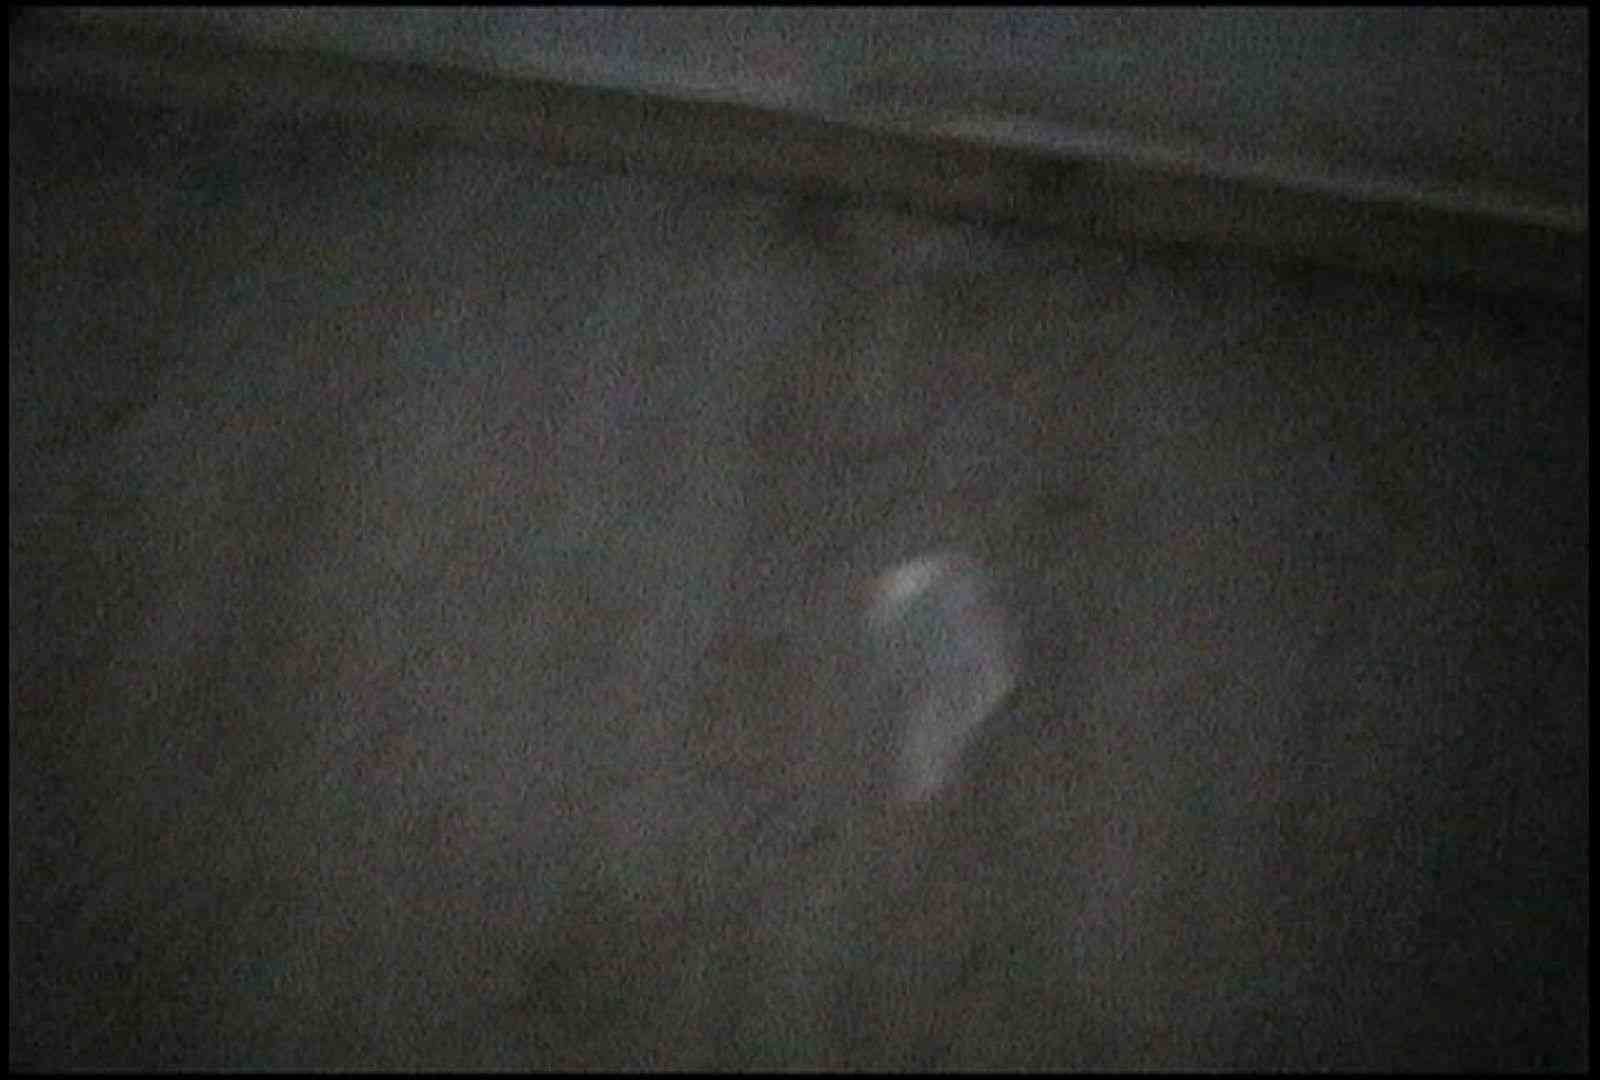 No.139 見上げる美乳 少し暗いのが残念! シャワー エロ画像 67画像 26